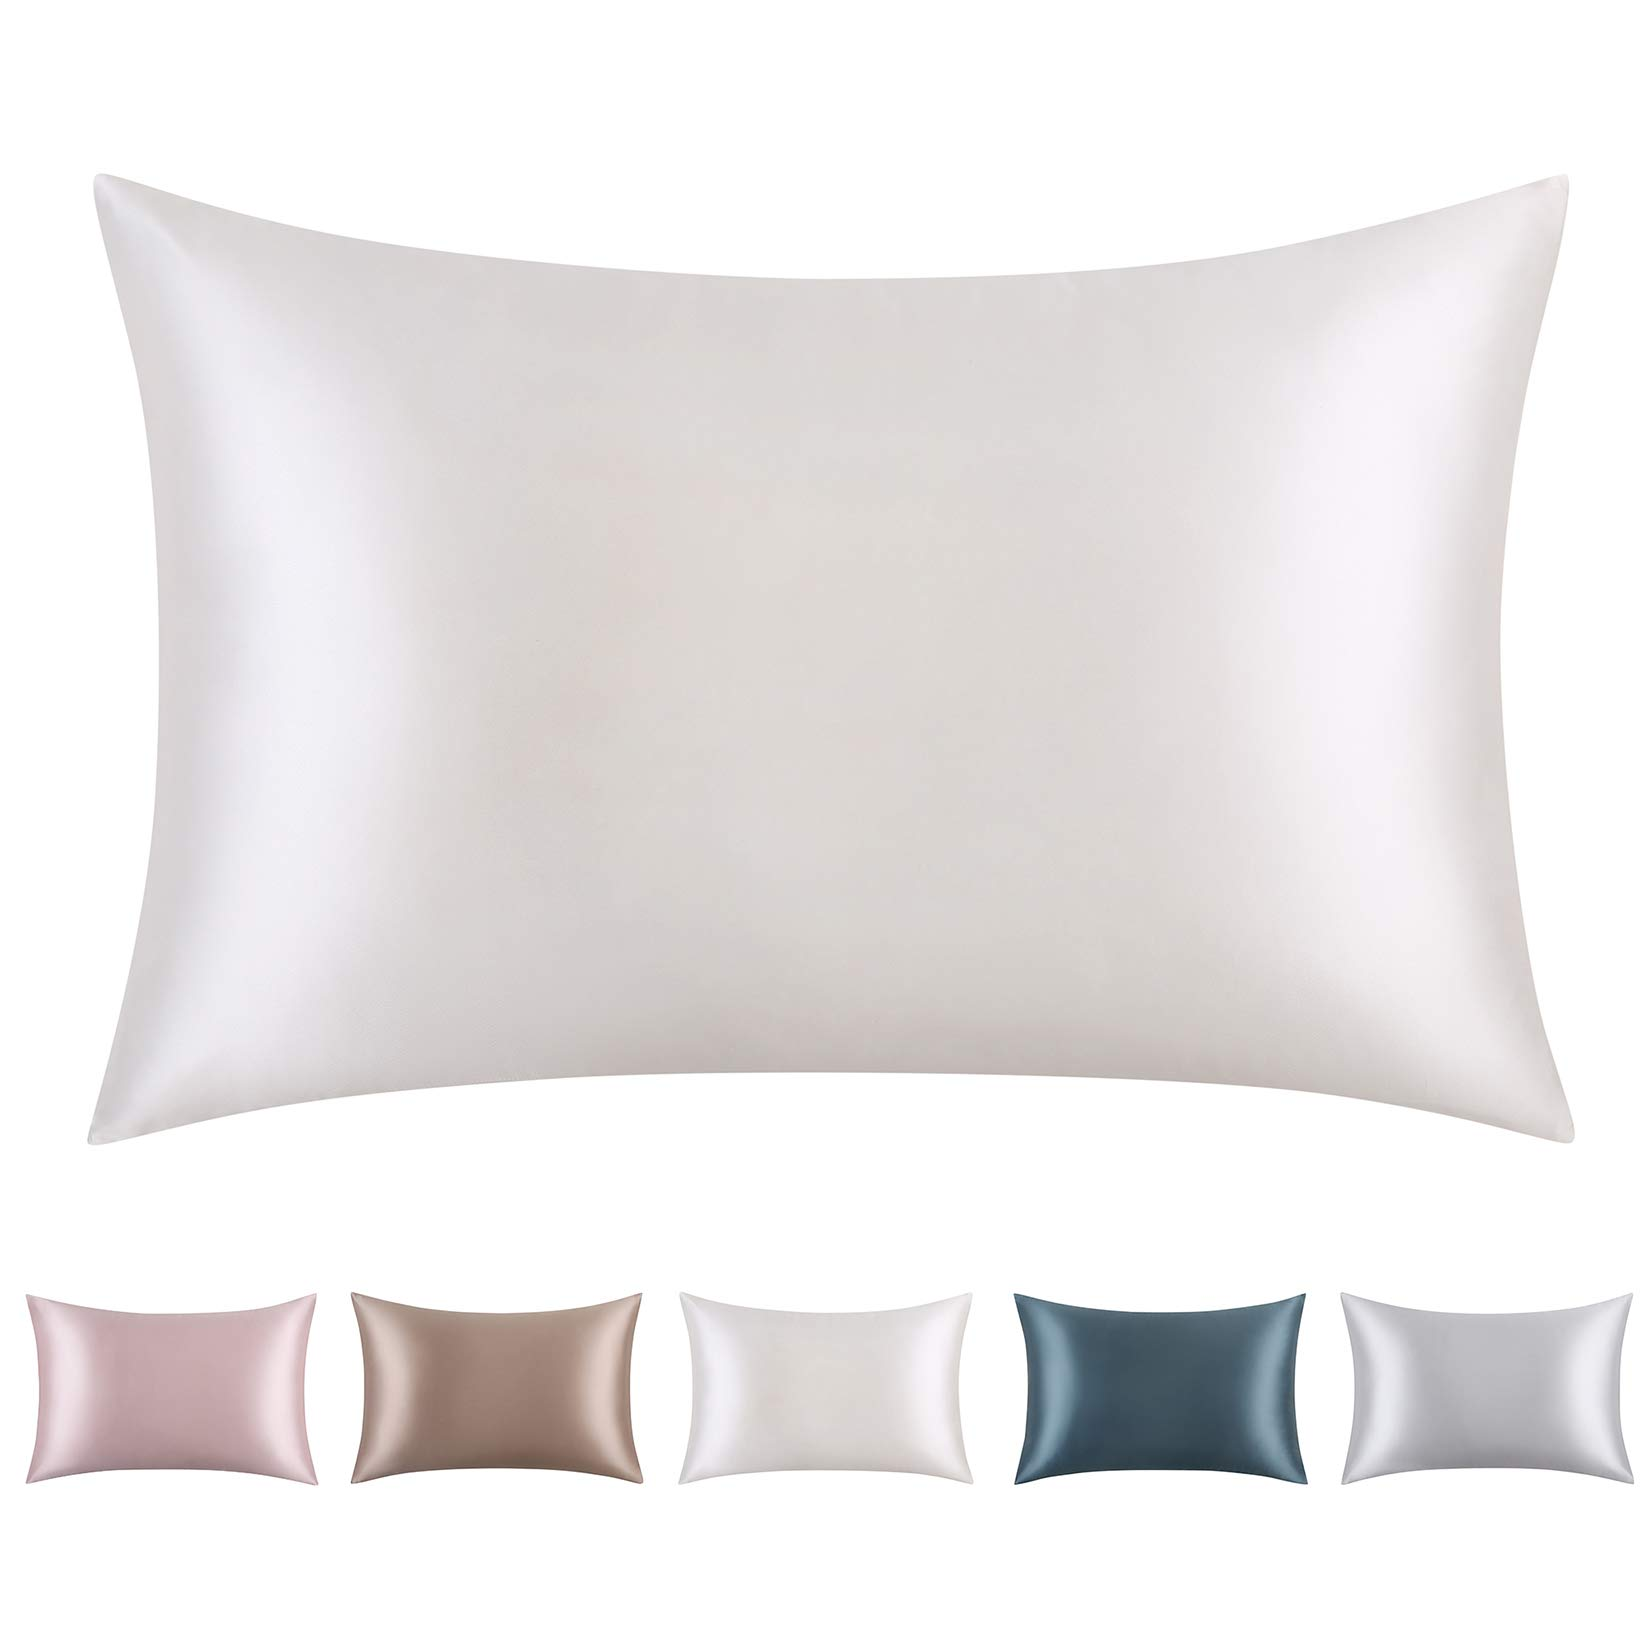 "CAROMIO 100% Pure Mulberry Silk Pillowcase for Skin & Hair, 19 Momme Silk with Hidden Zipper, Soft Breathable Grade 6A Long Fiber Natural Silk Pillow Case, White, Queen 20""x30"""